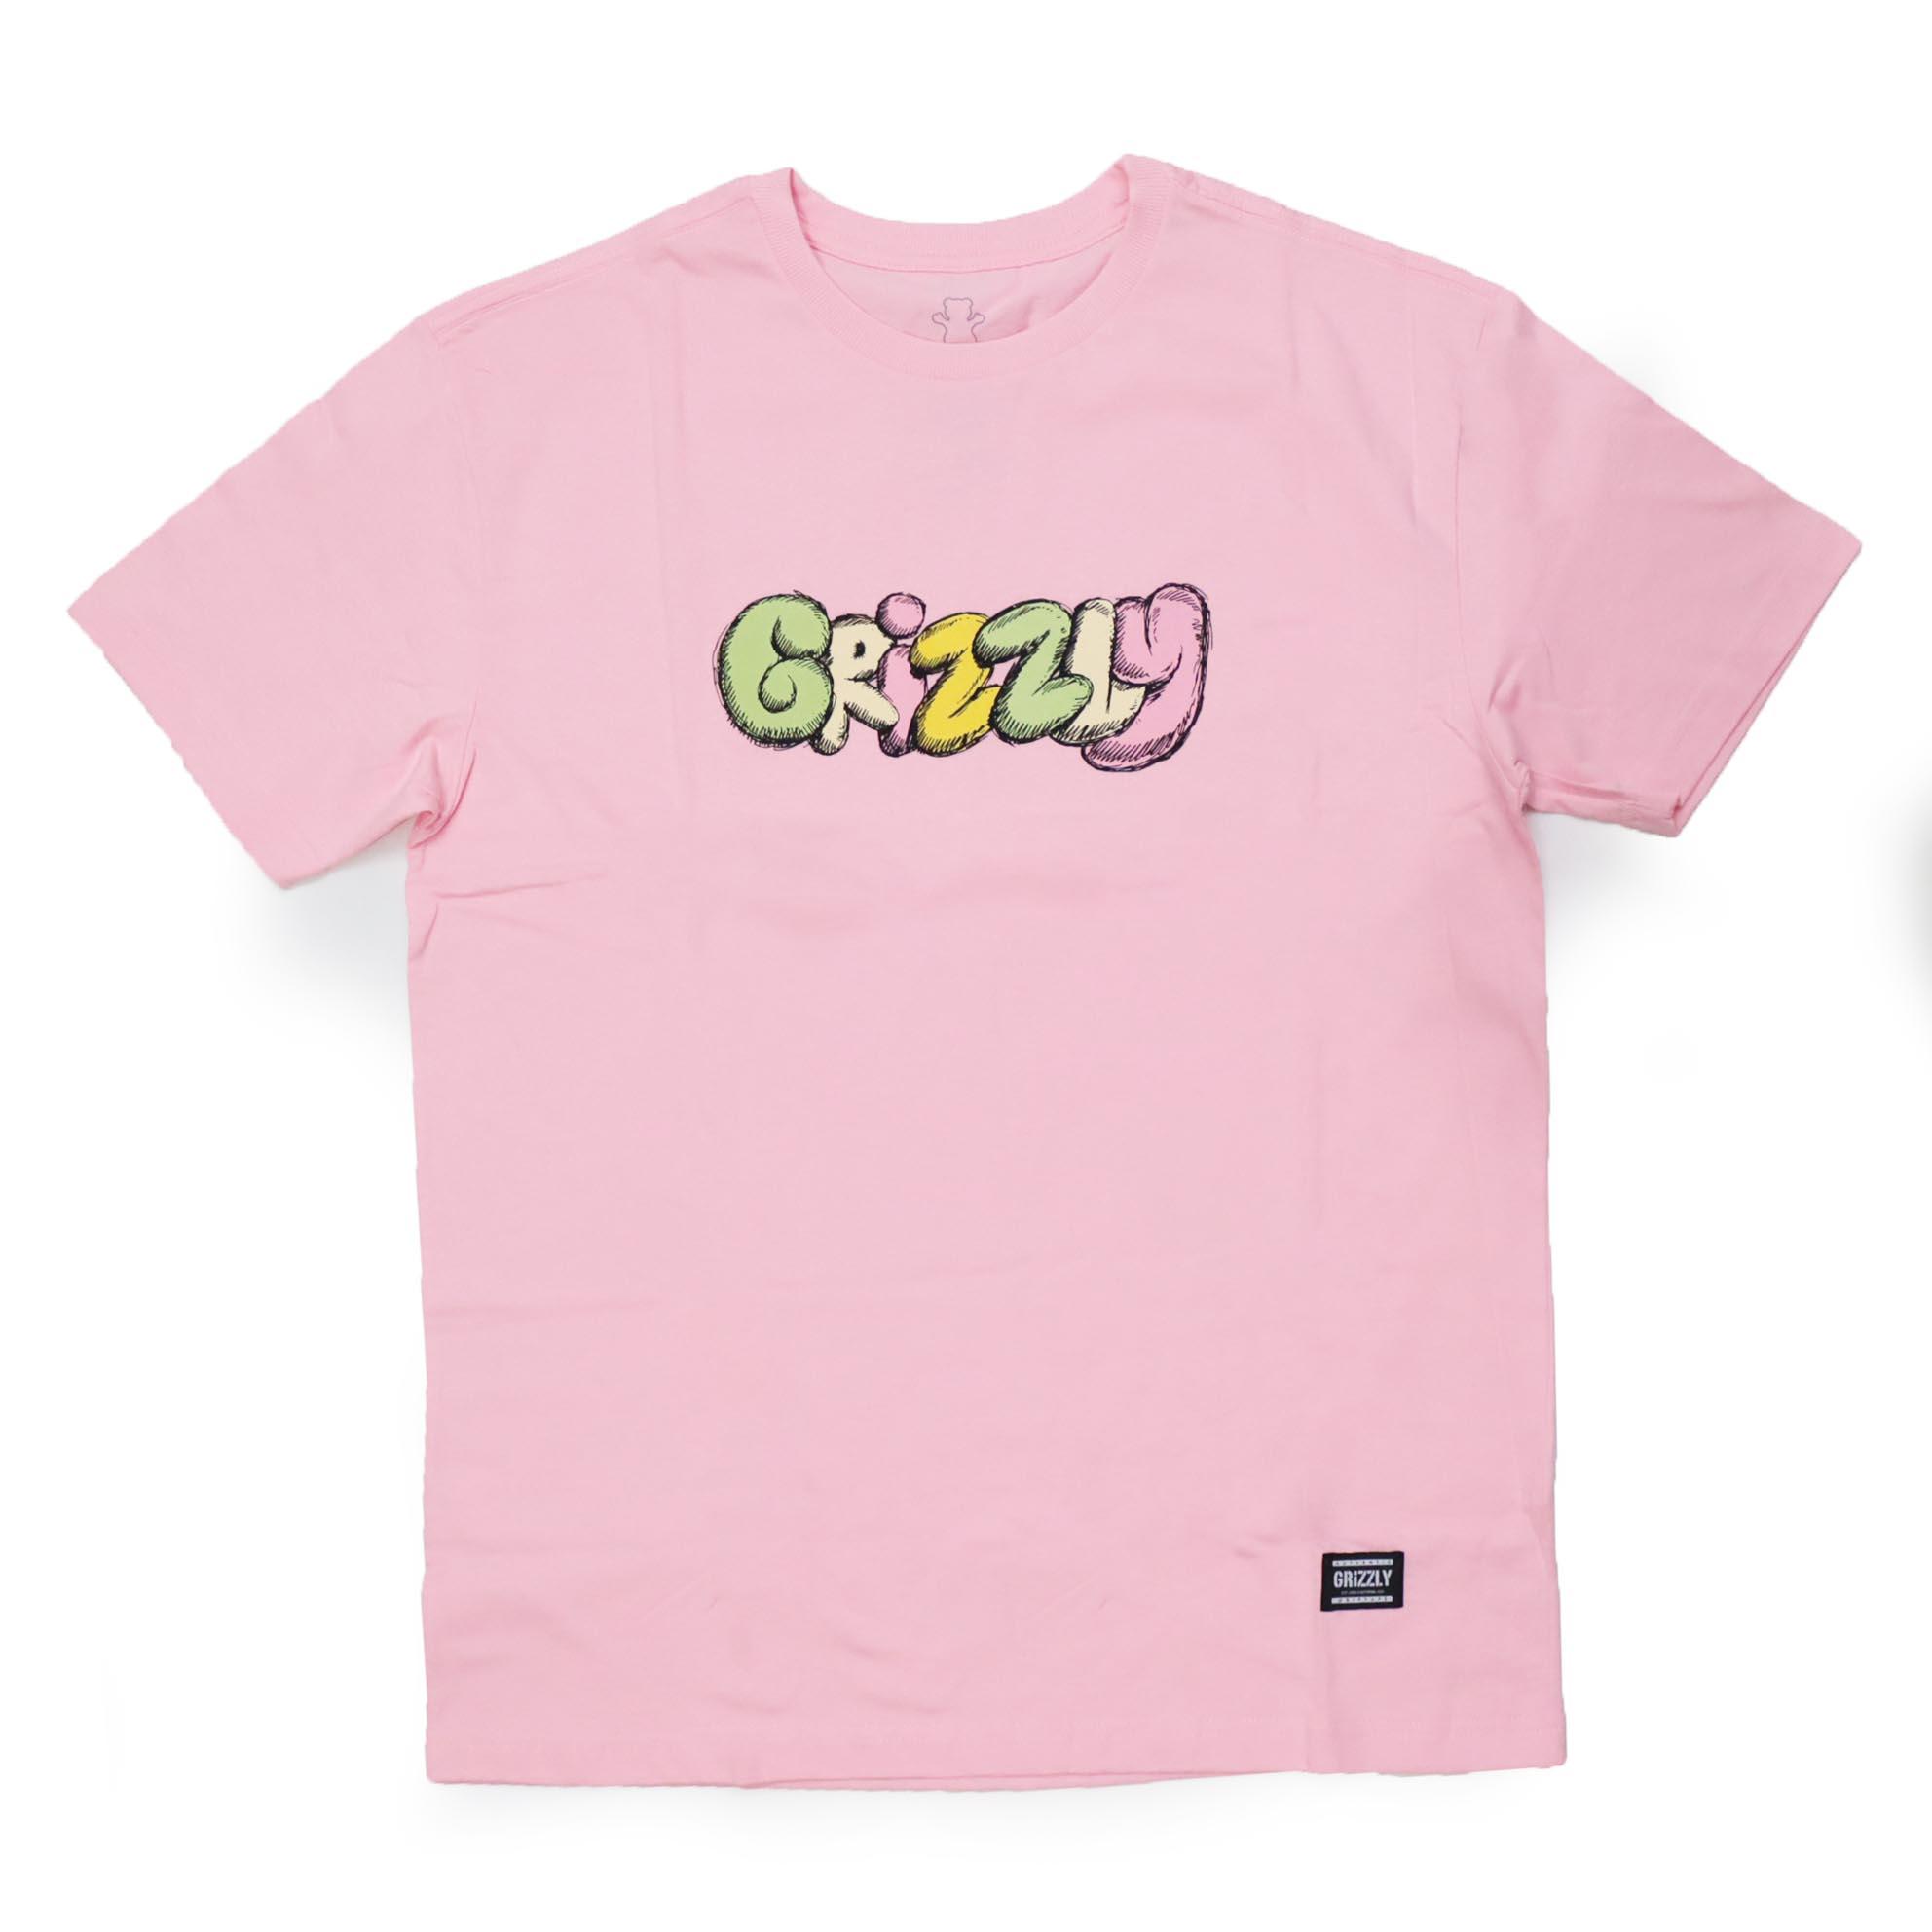 Camiseta Grizzly Fuzzy - Rosa